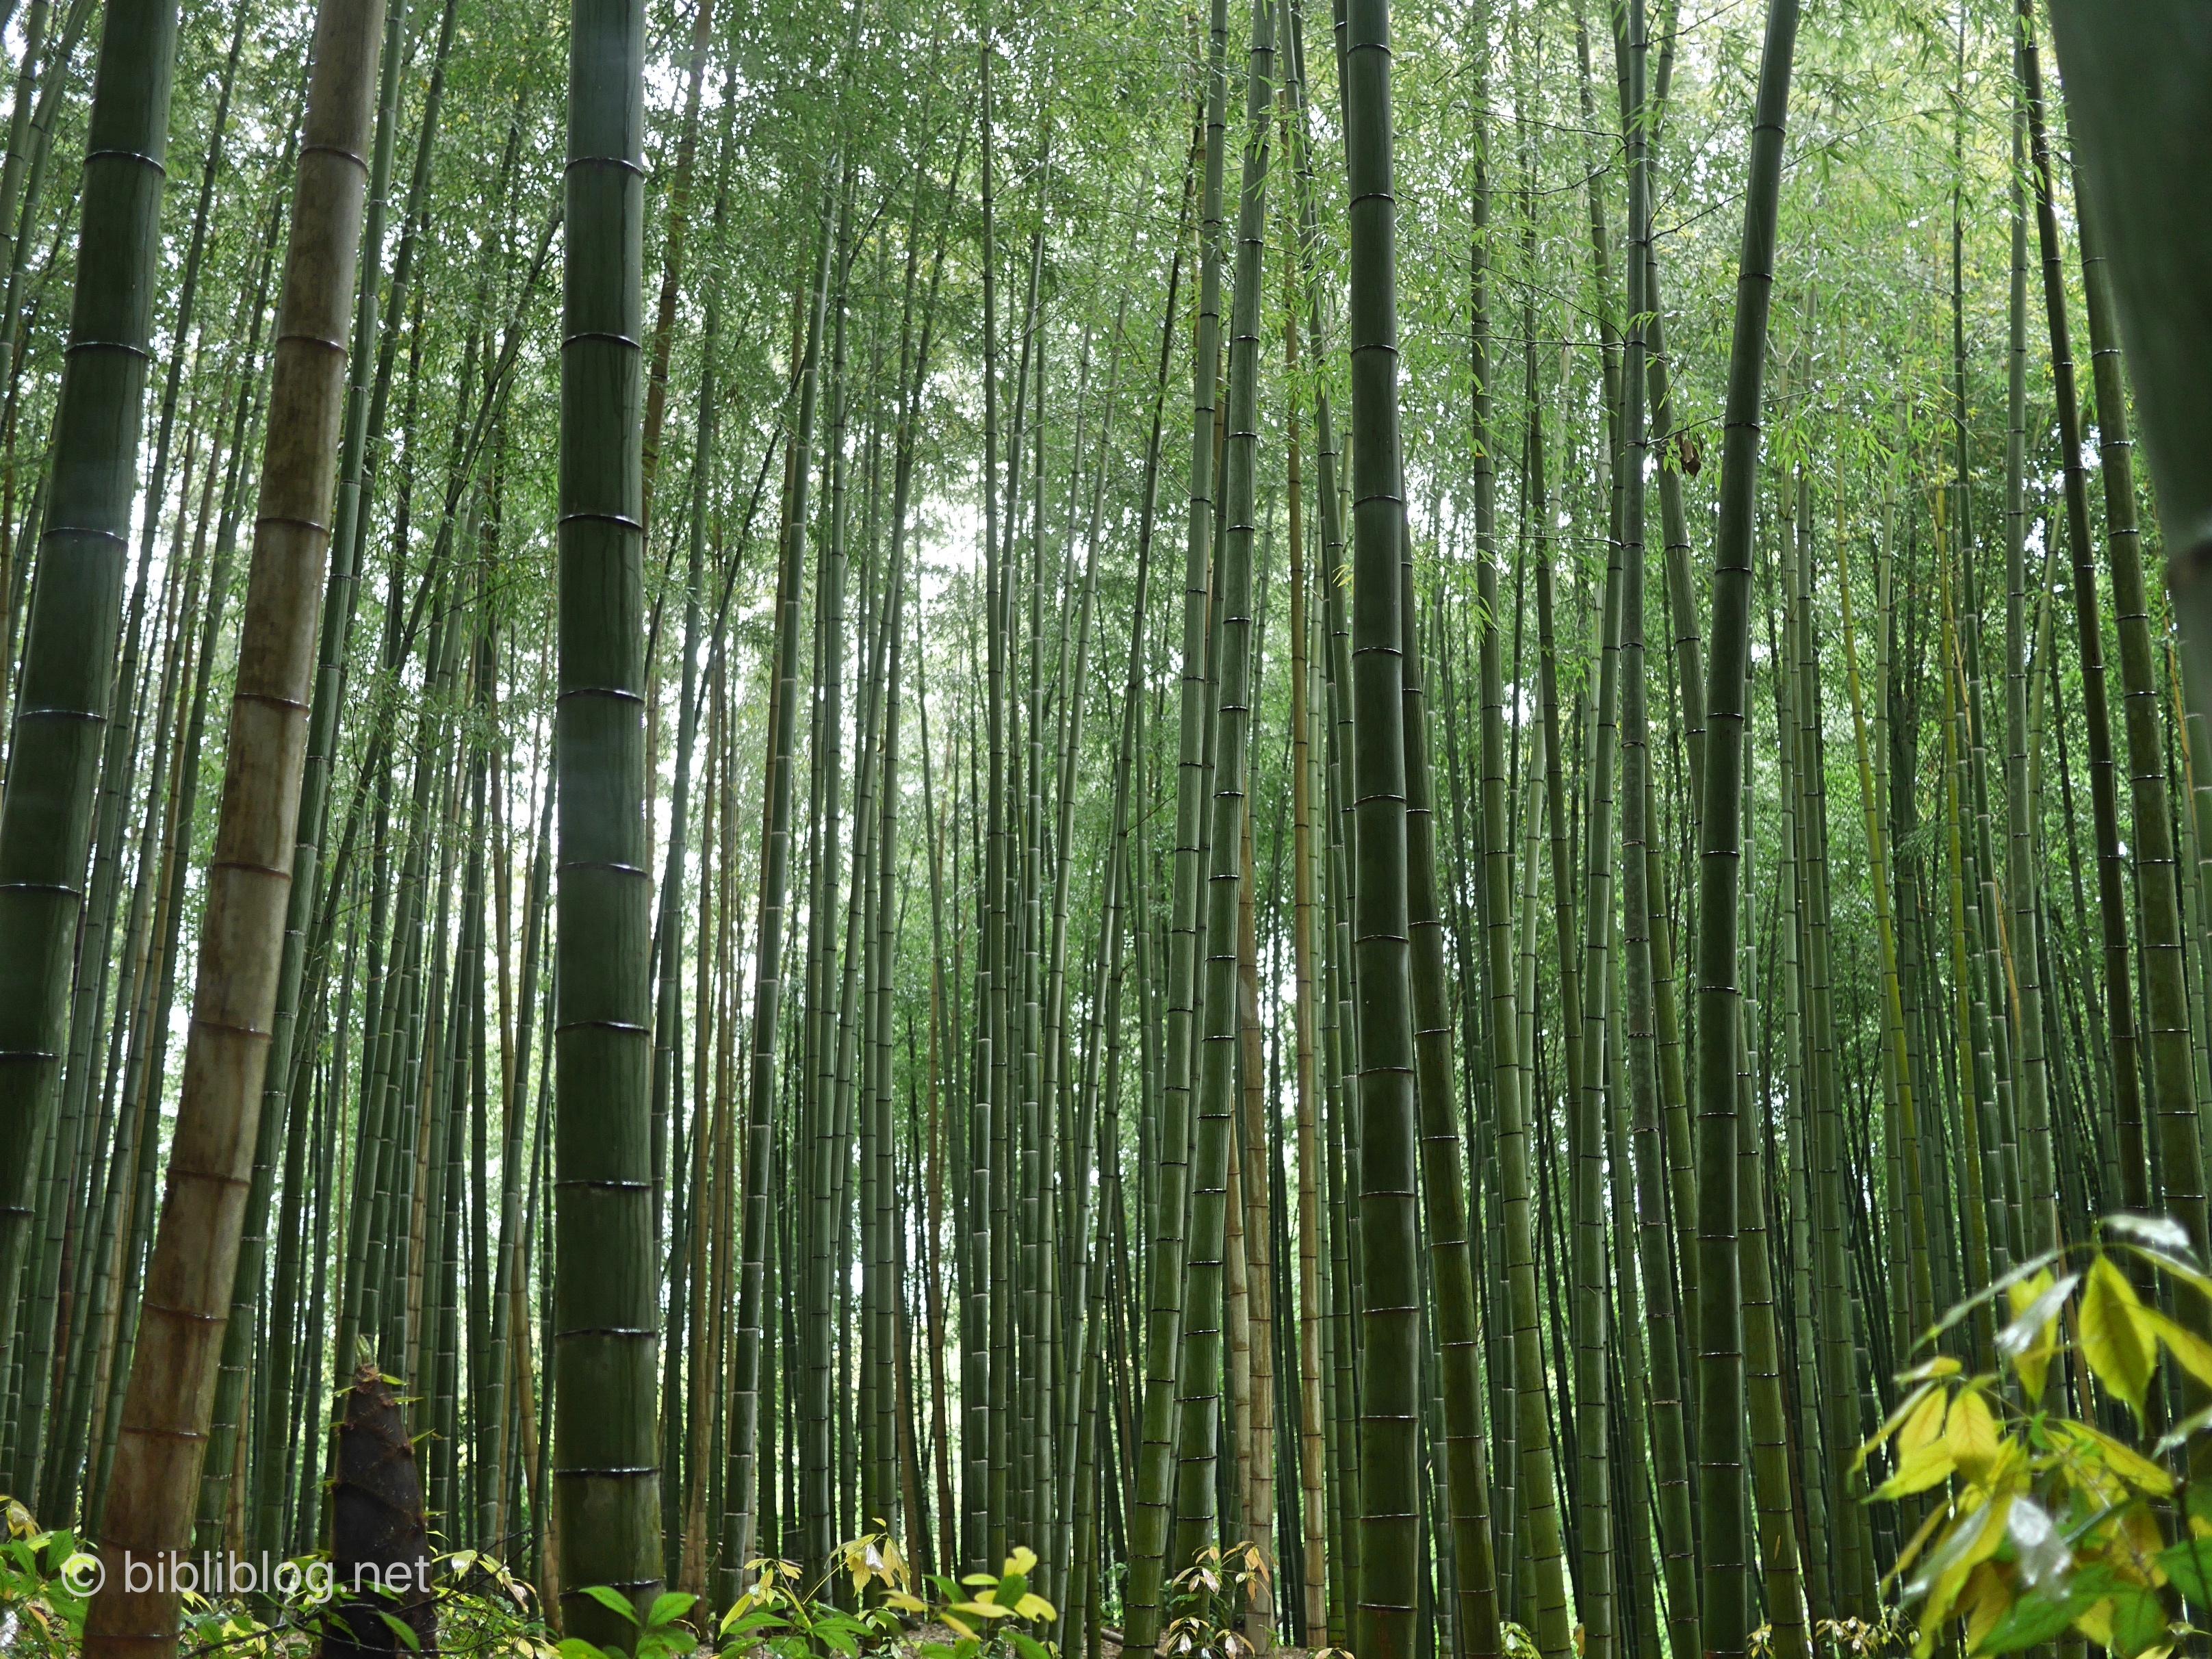 foret-bambous-kyoto-dense